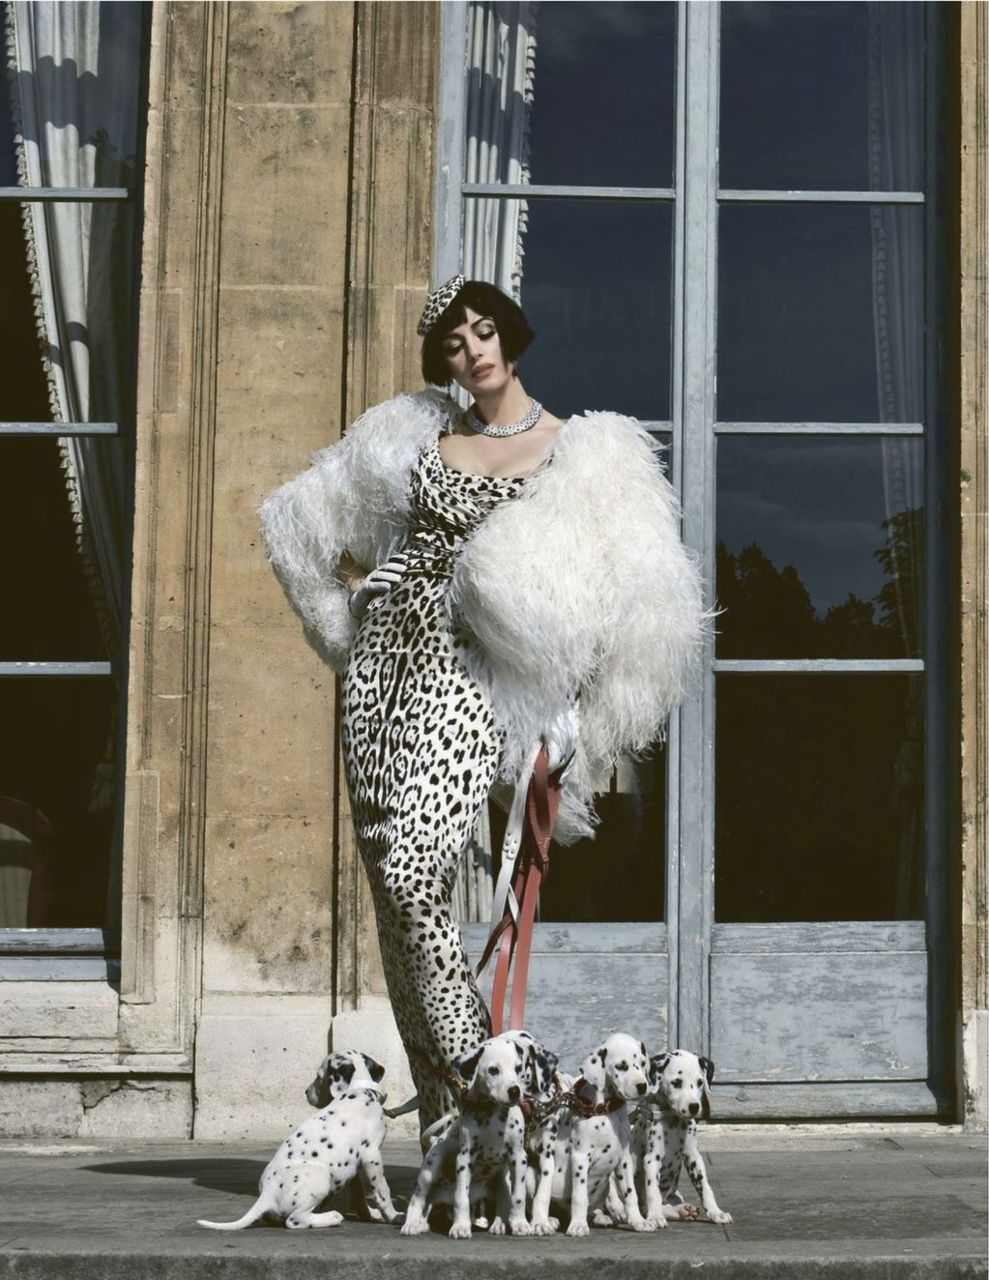 Monica Bellucci photographed by Francesco Escalar for Tatler Russia, December 2011. Channelling Cruella?